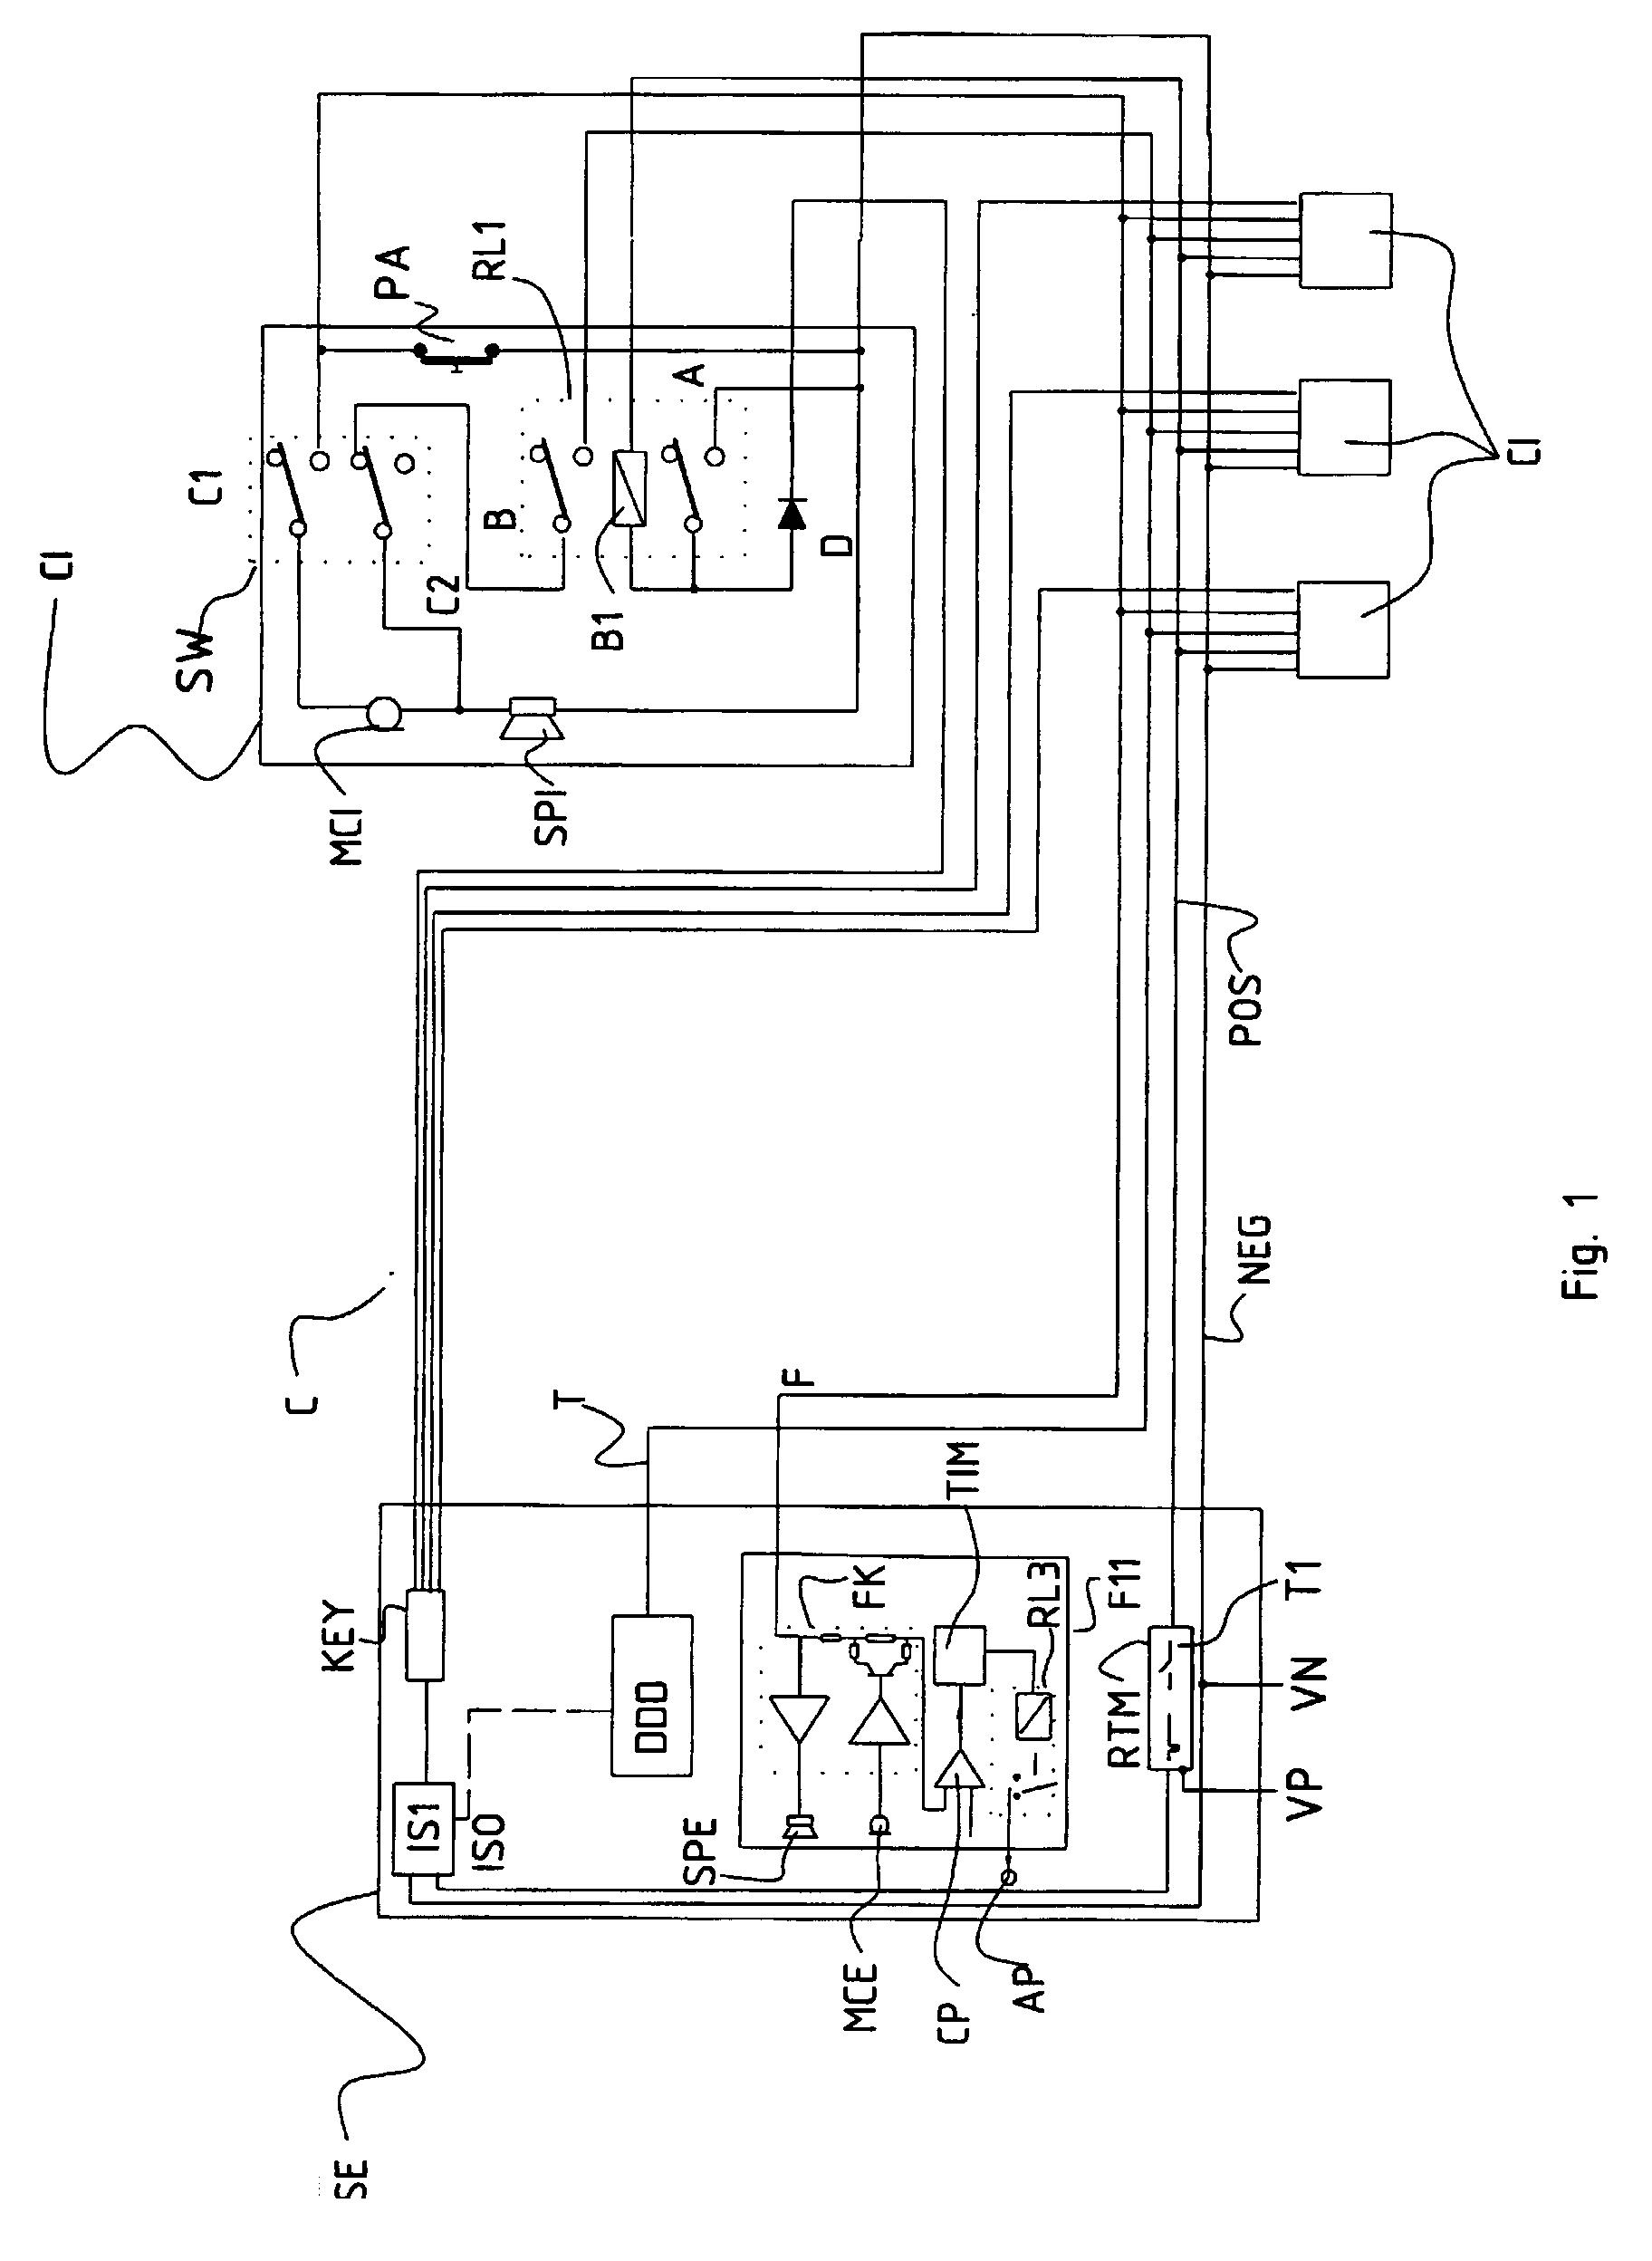 magnetek power converter 6345 wiring diagram on magnetek download.  00100001?resize\\\\\\\=665%2C910 magnetek power